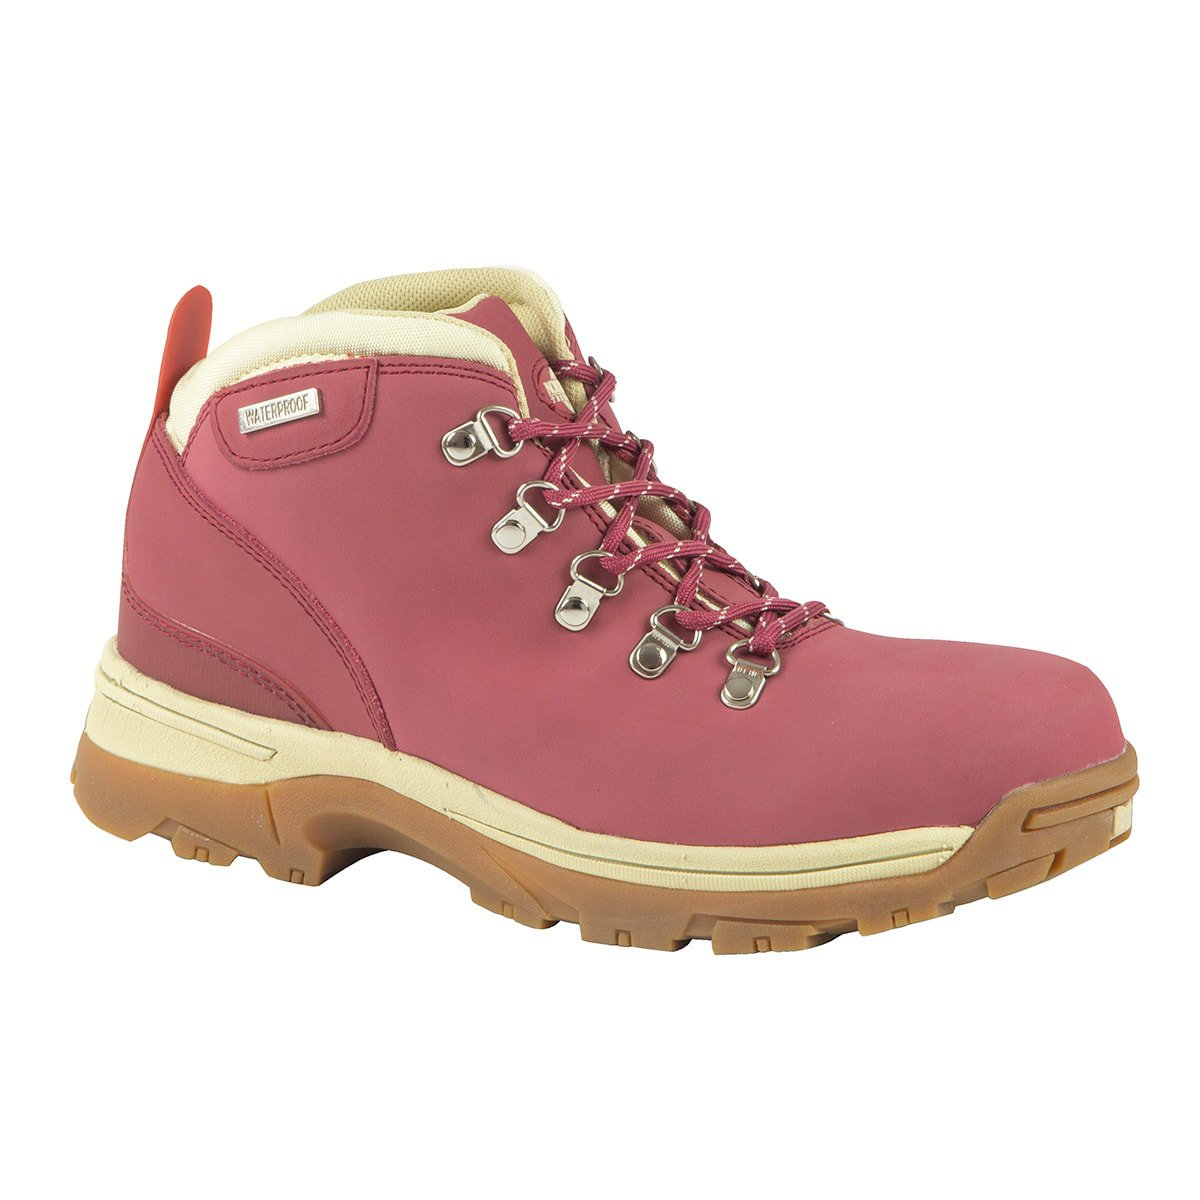 Northwest Territory Women's Waterproof Leather Walking and Hiking Boot I Trek Grey (UK SIZES 3-8)